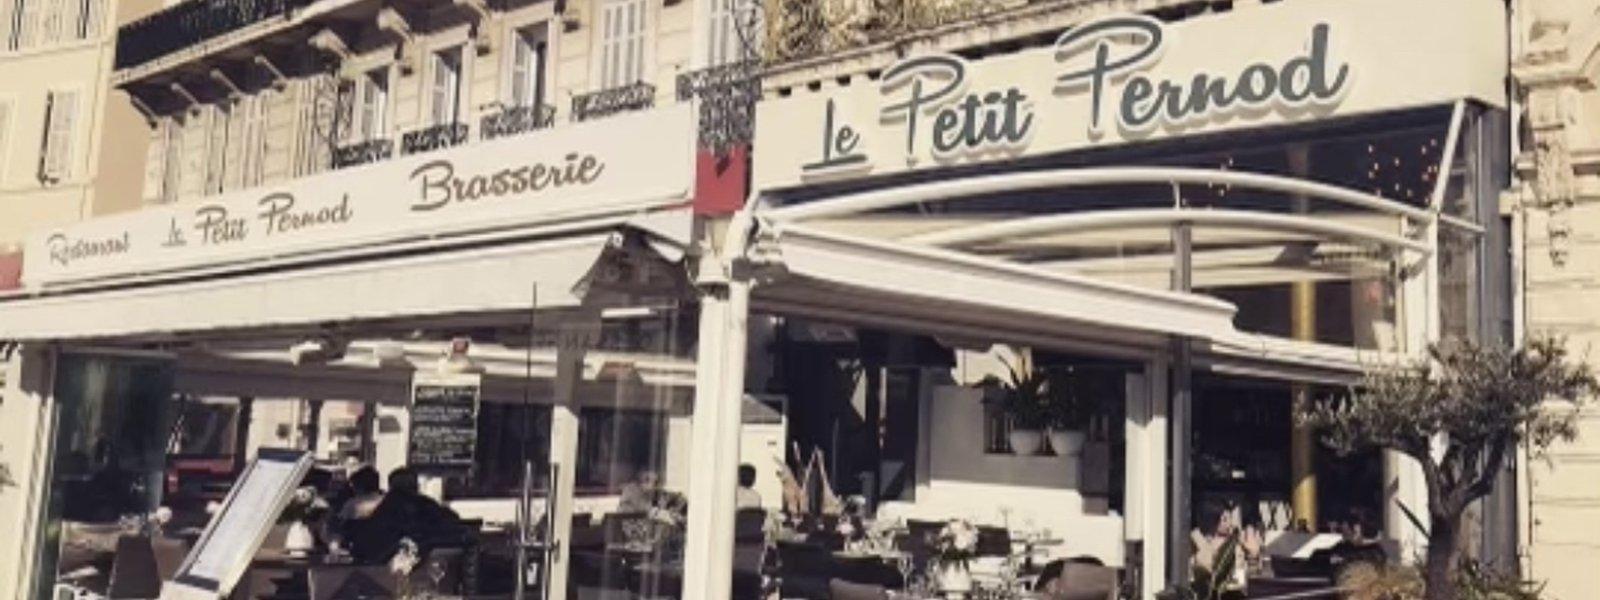 Le Petit Pernod image header